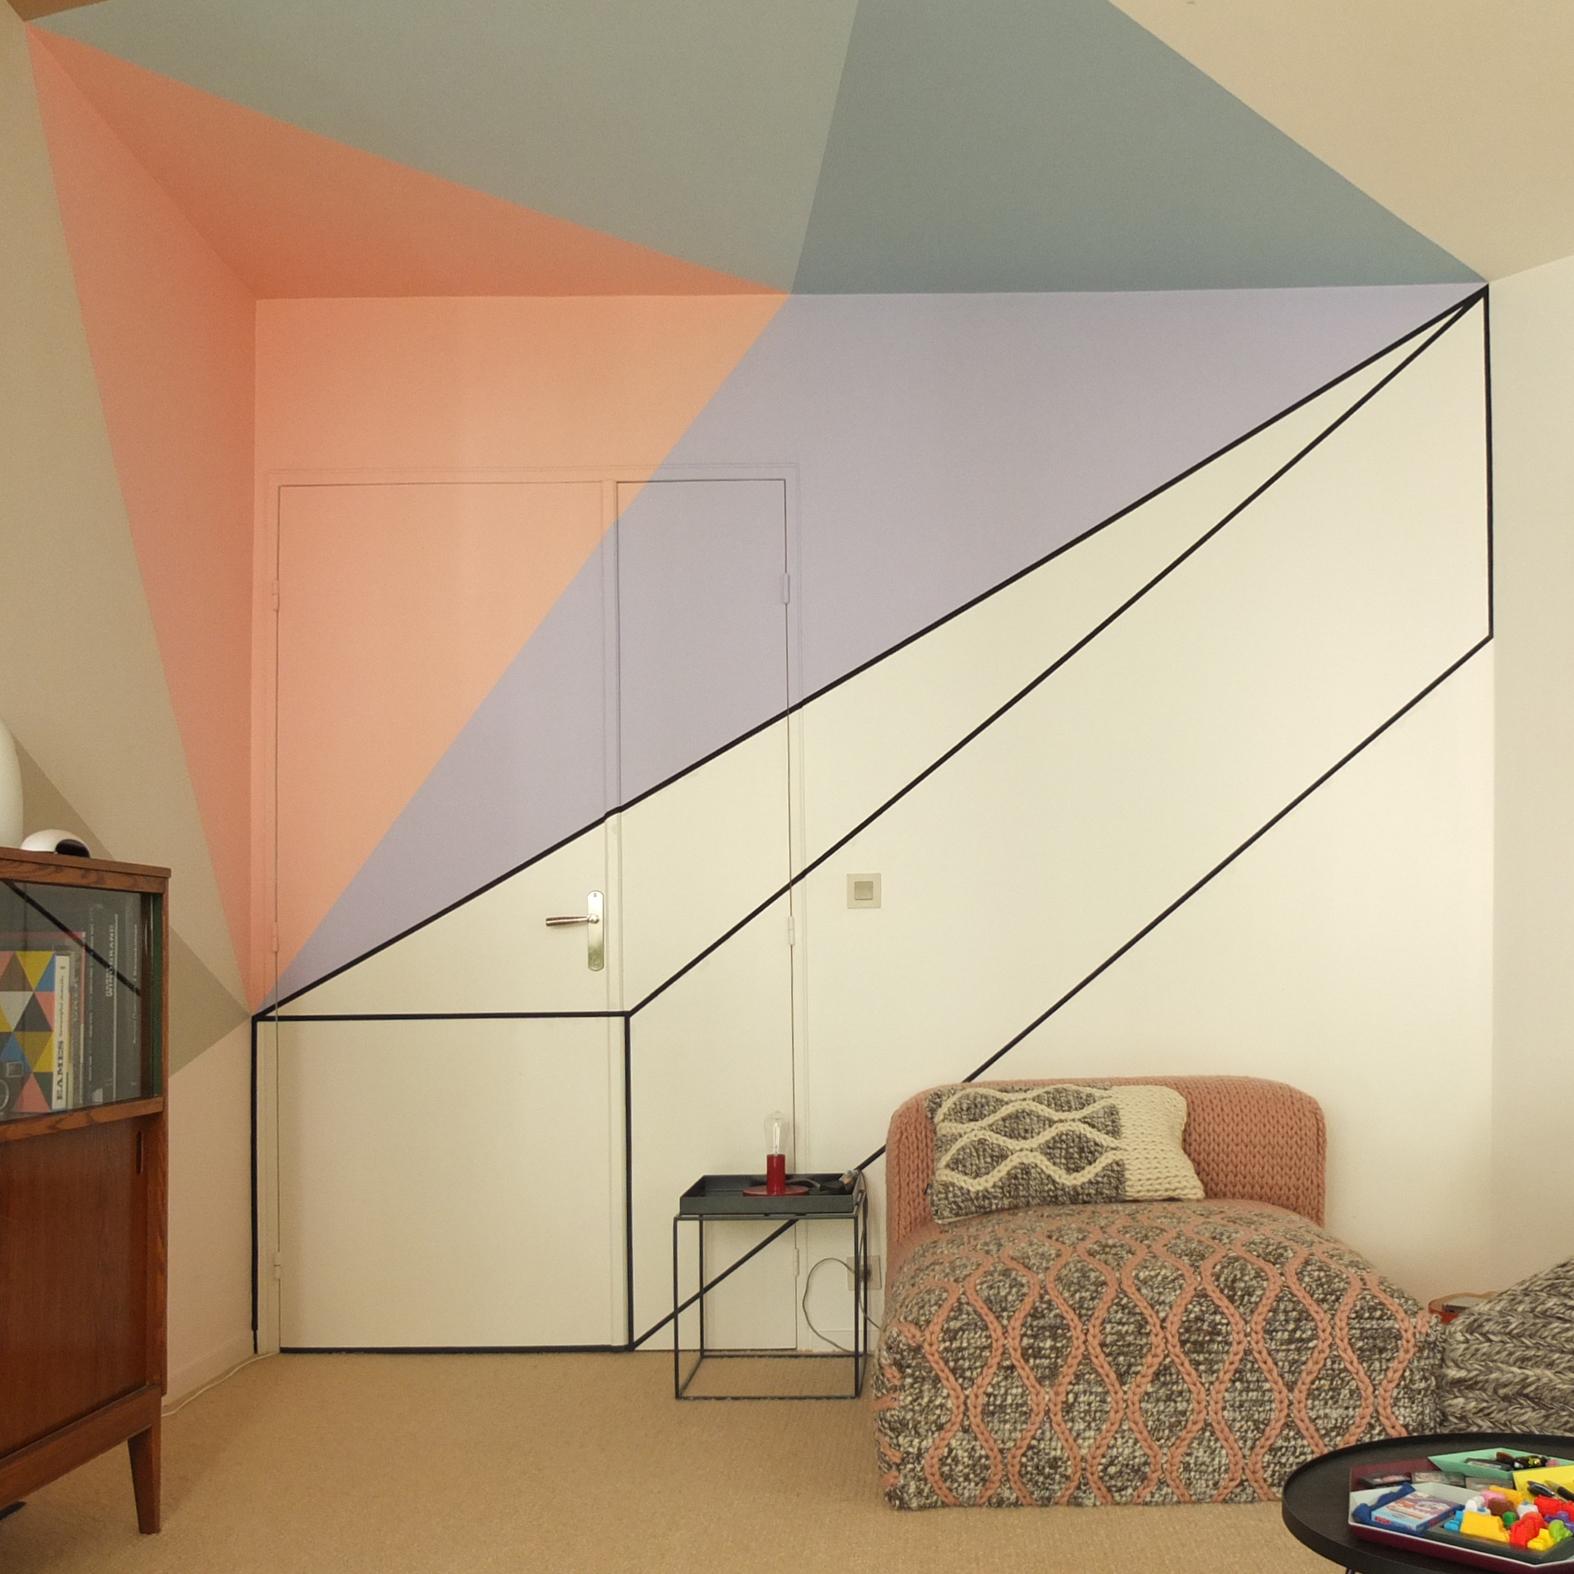 Prism #5 (wallsandwonders.com)